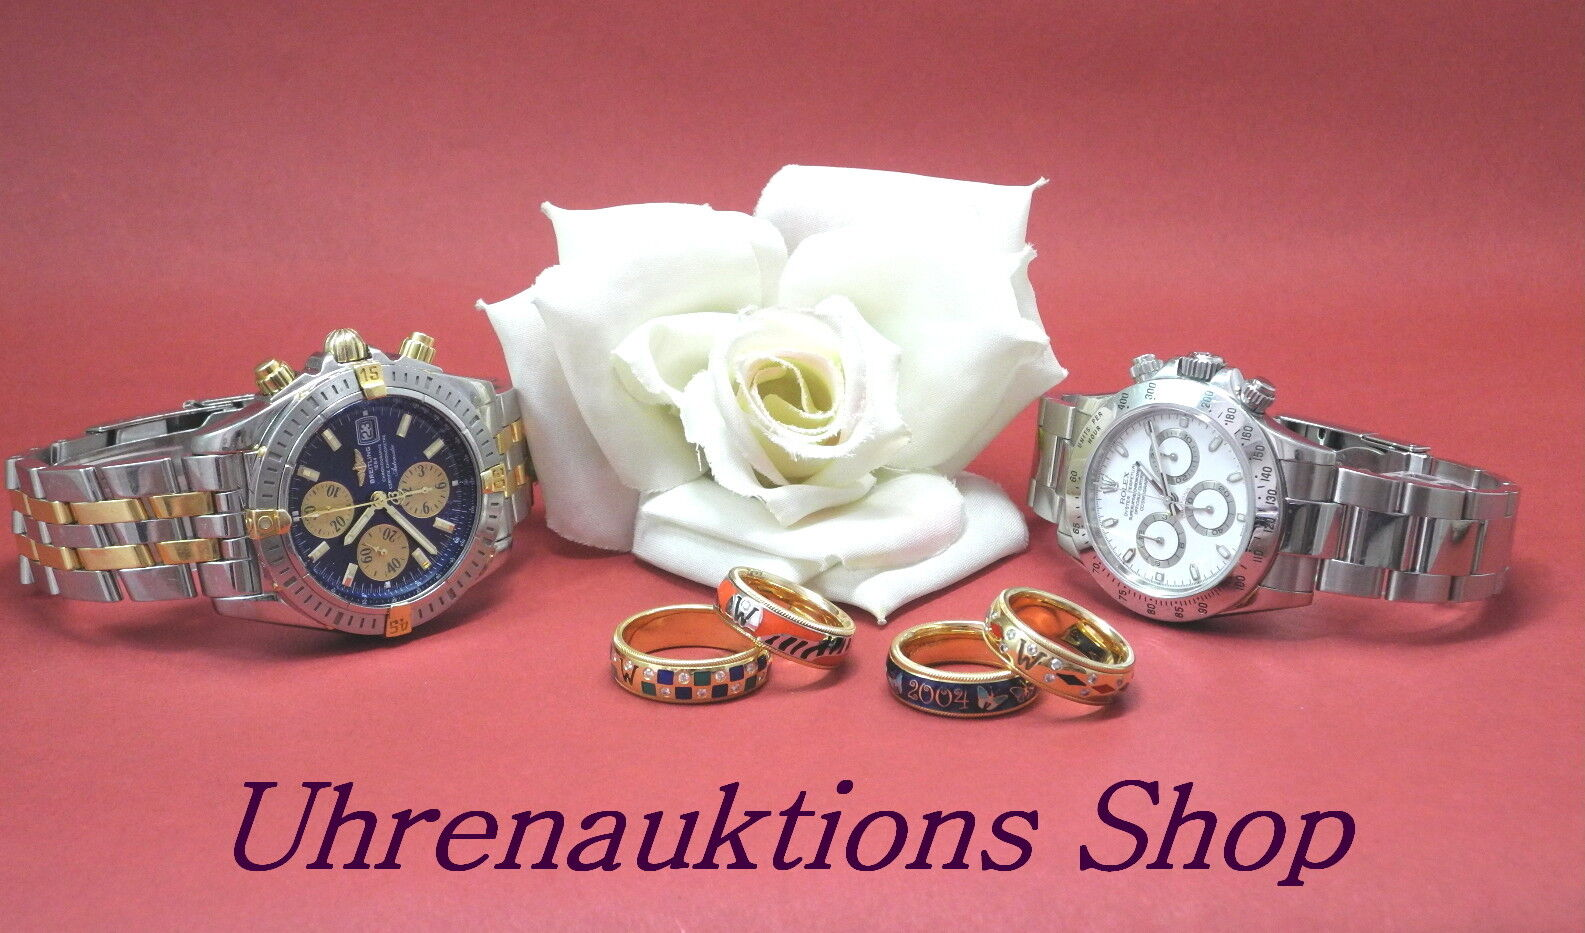 Uhrenauktions Shop